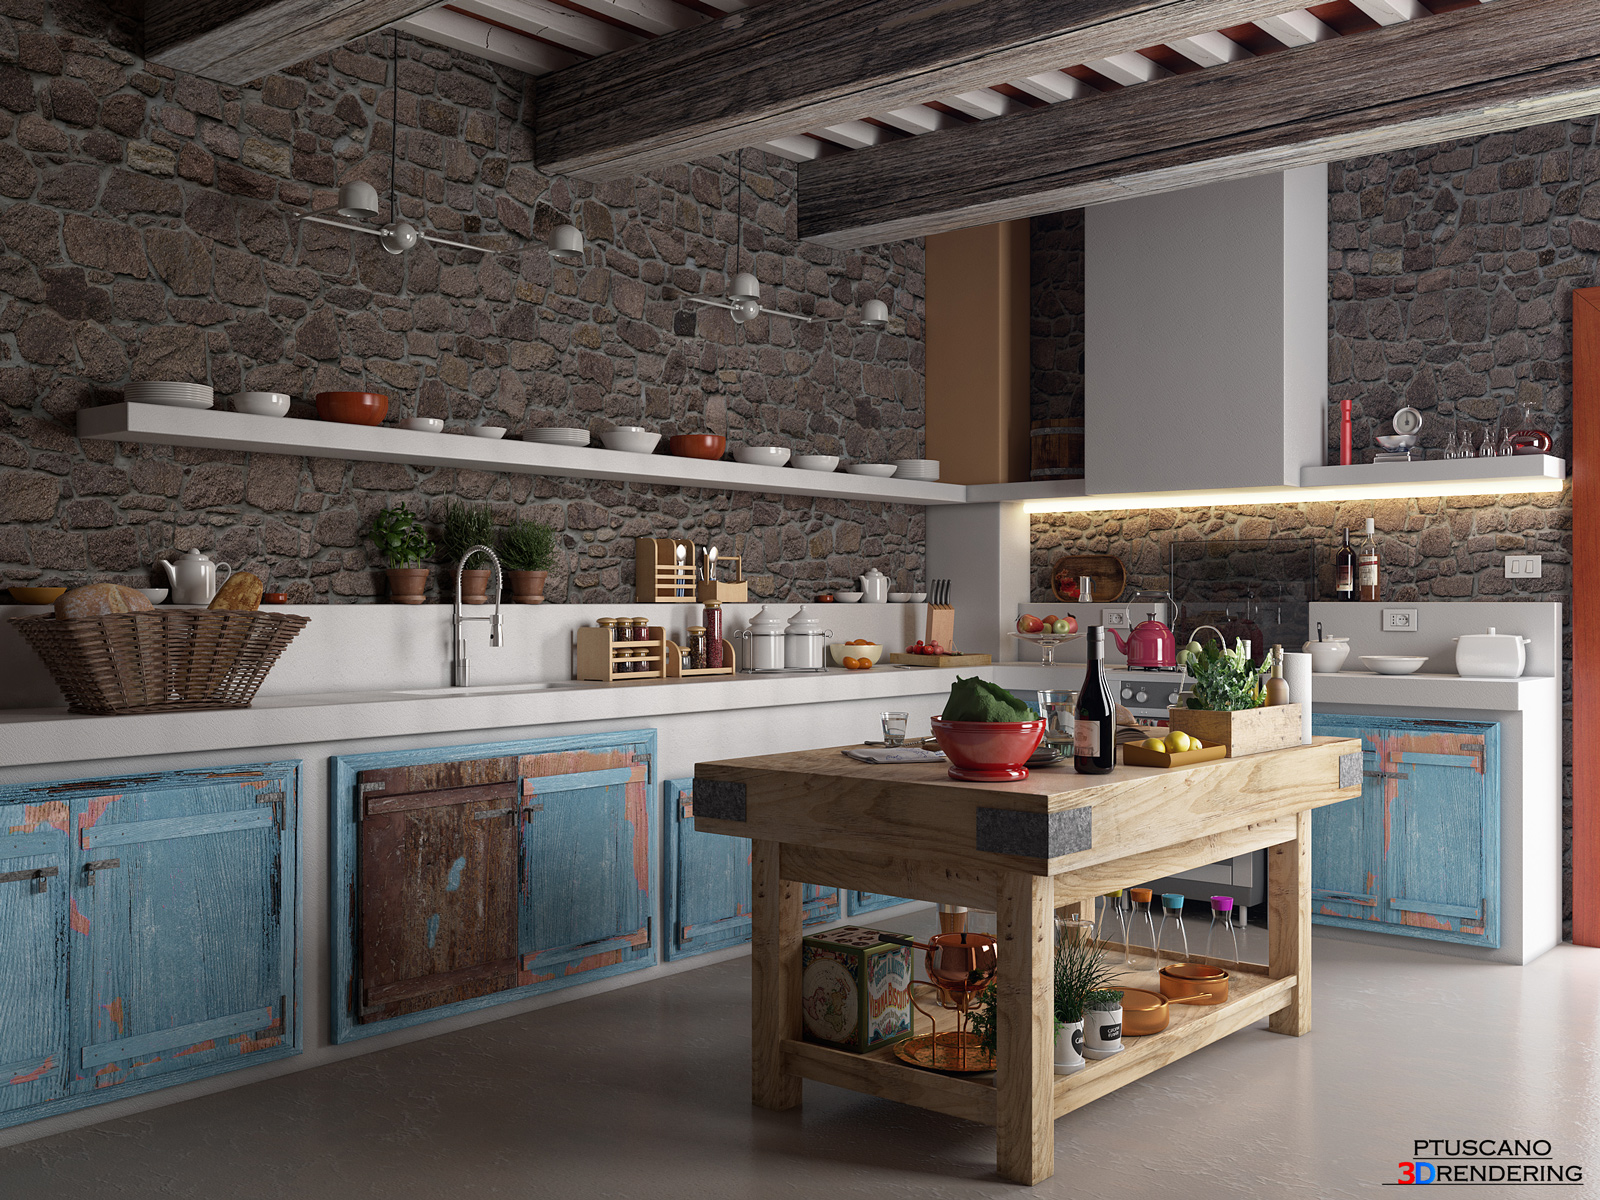 Cucina rustica final architettura e interior design for Cucina rustica